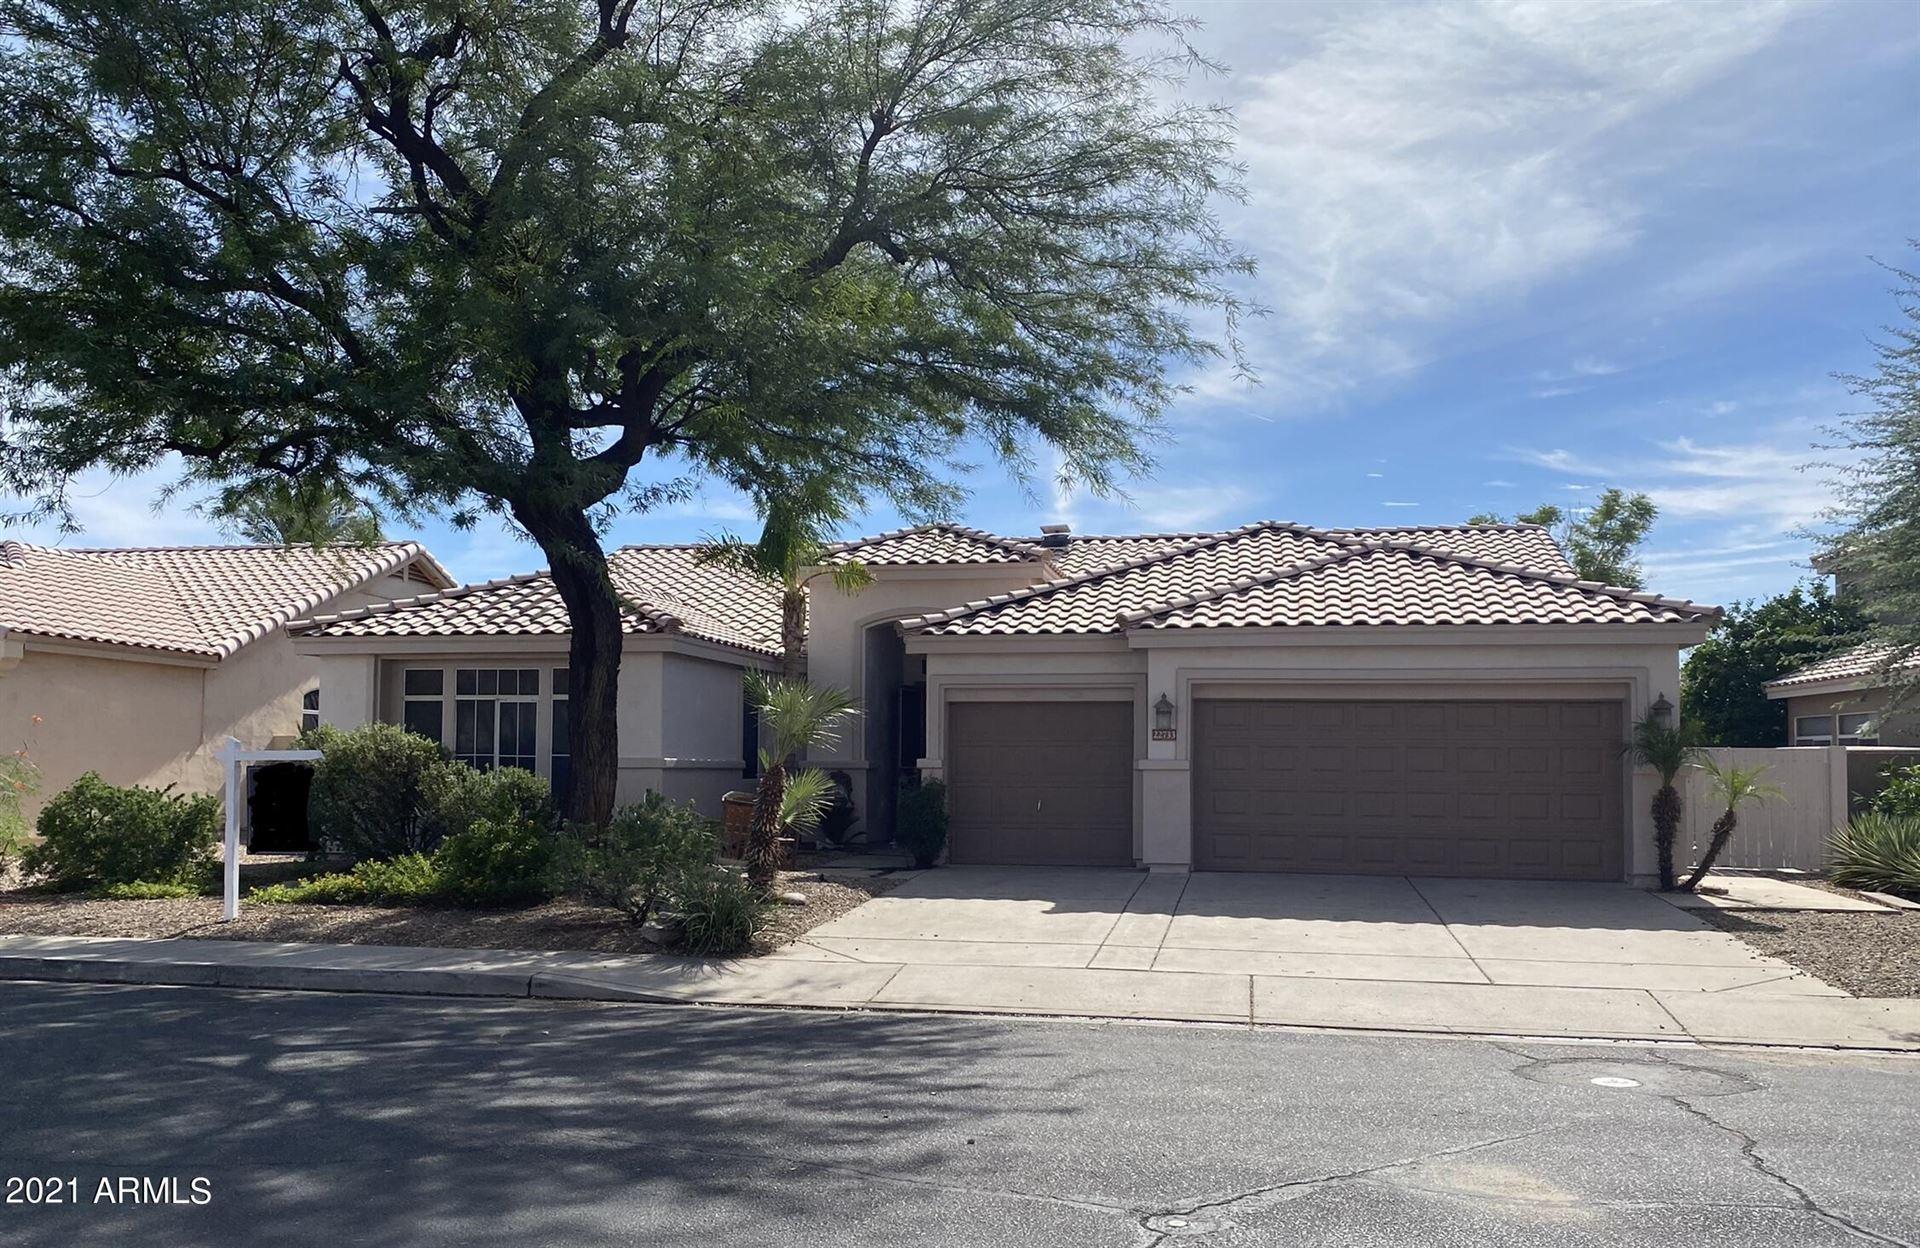 Photo of 22733 N 73RD Drive, Glendale, AZ 85310 (MLS # 6301871)